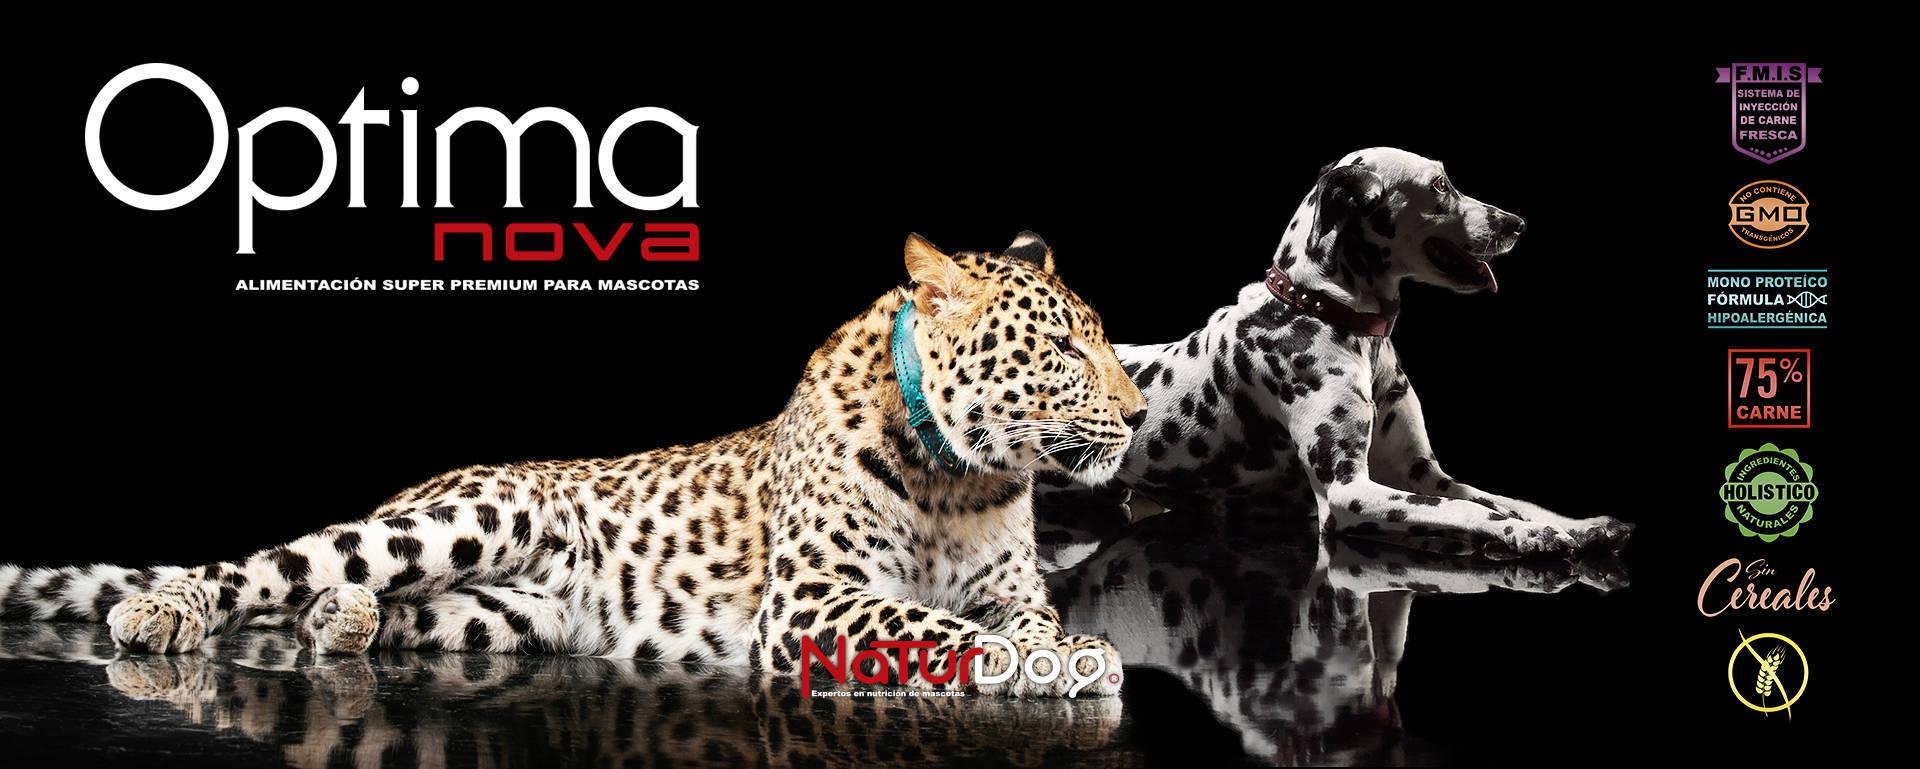 Optima nova Dalmata Leopardo NaturDog web by TecniPublic.es